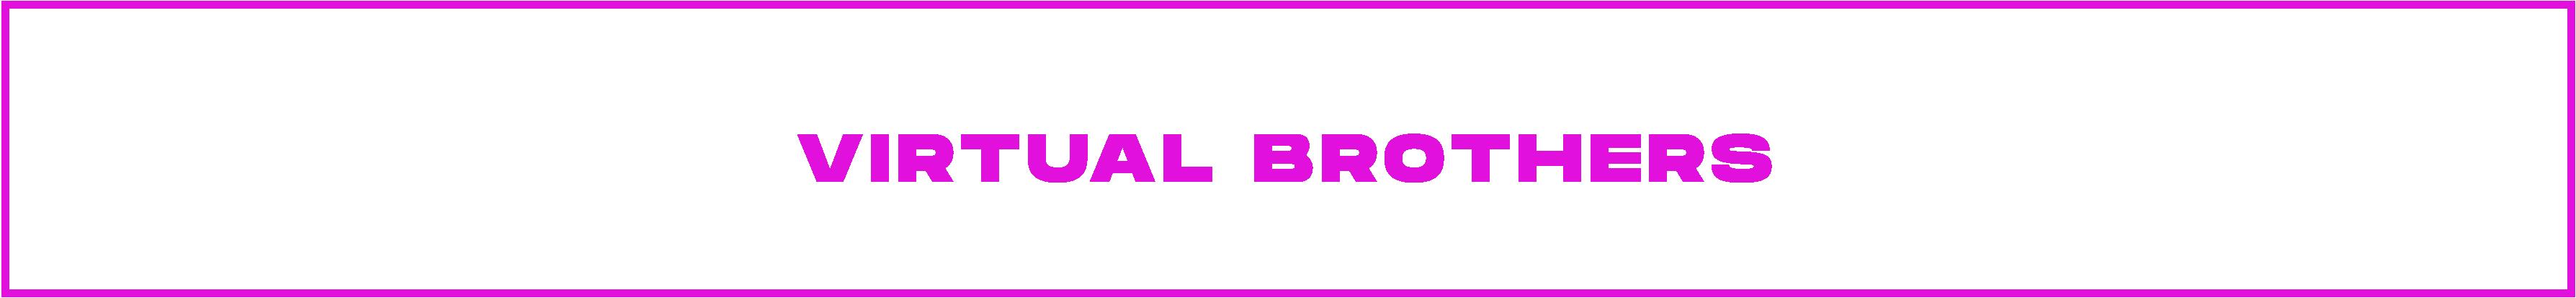 virtual brothers